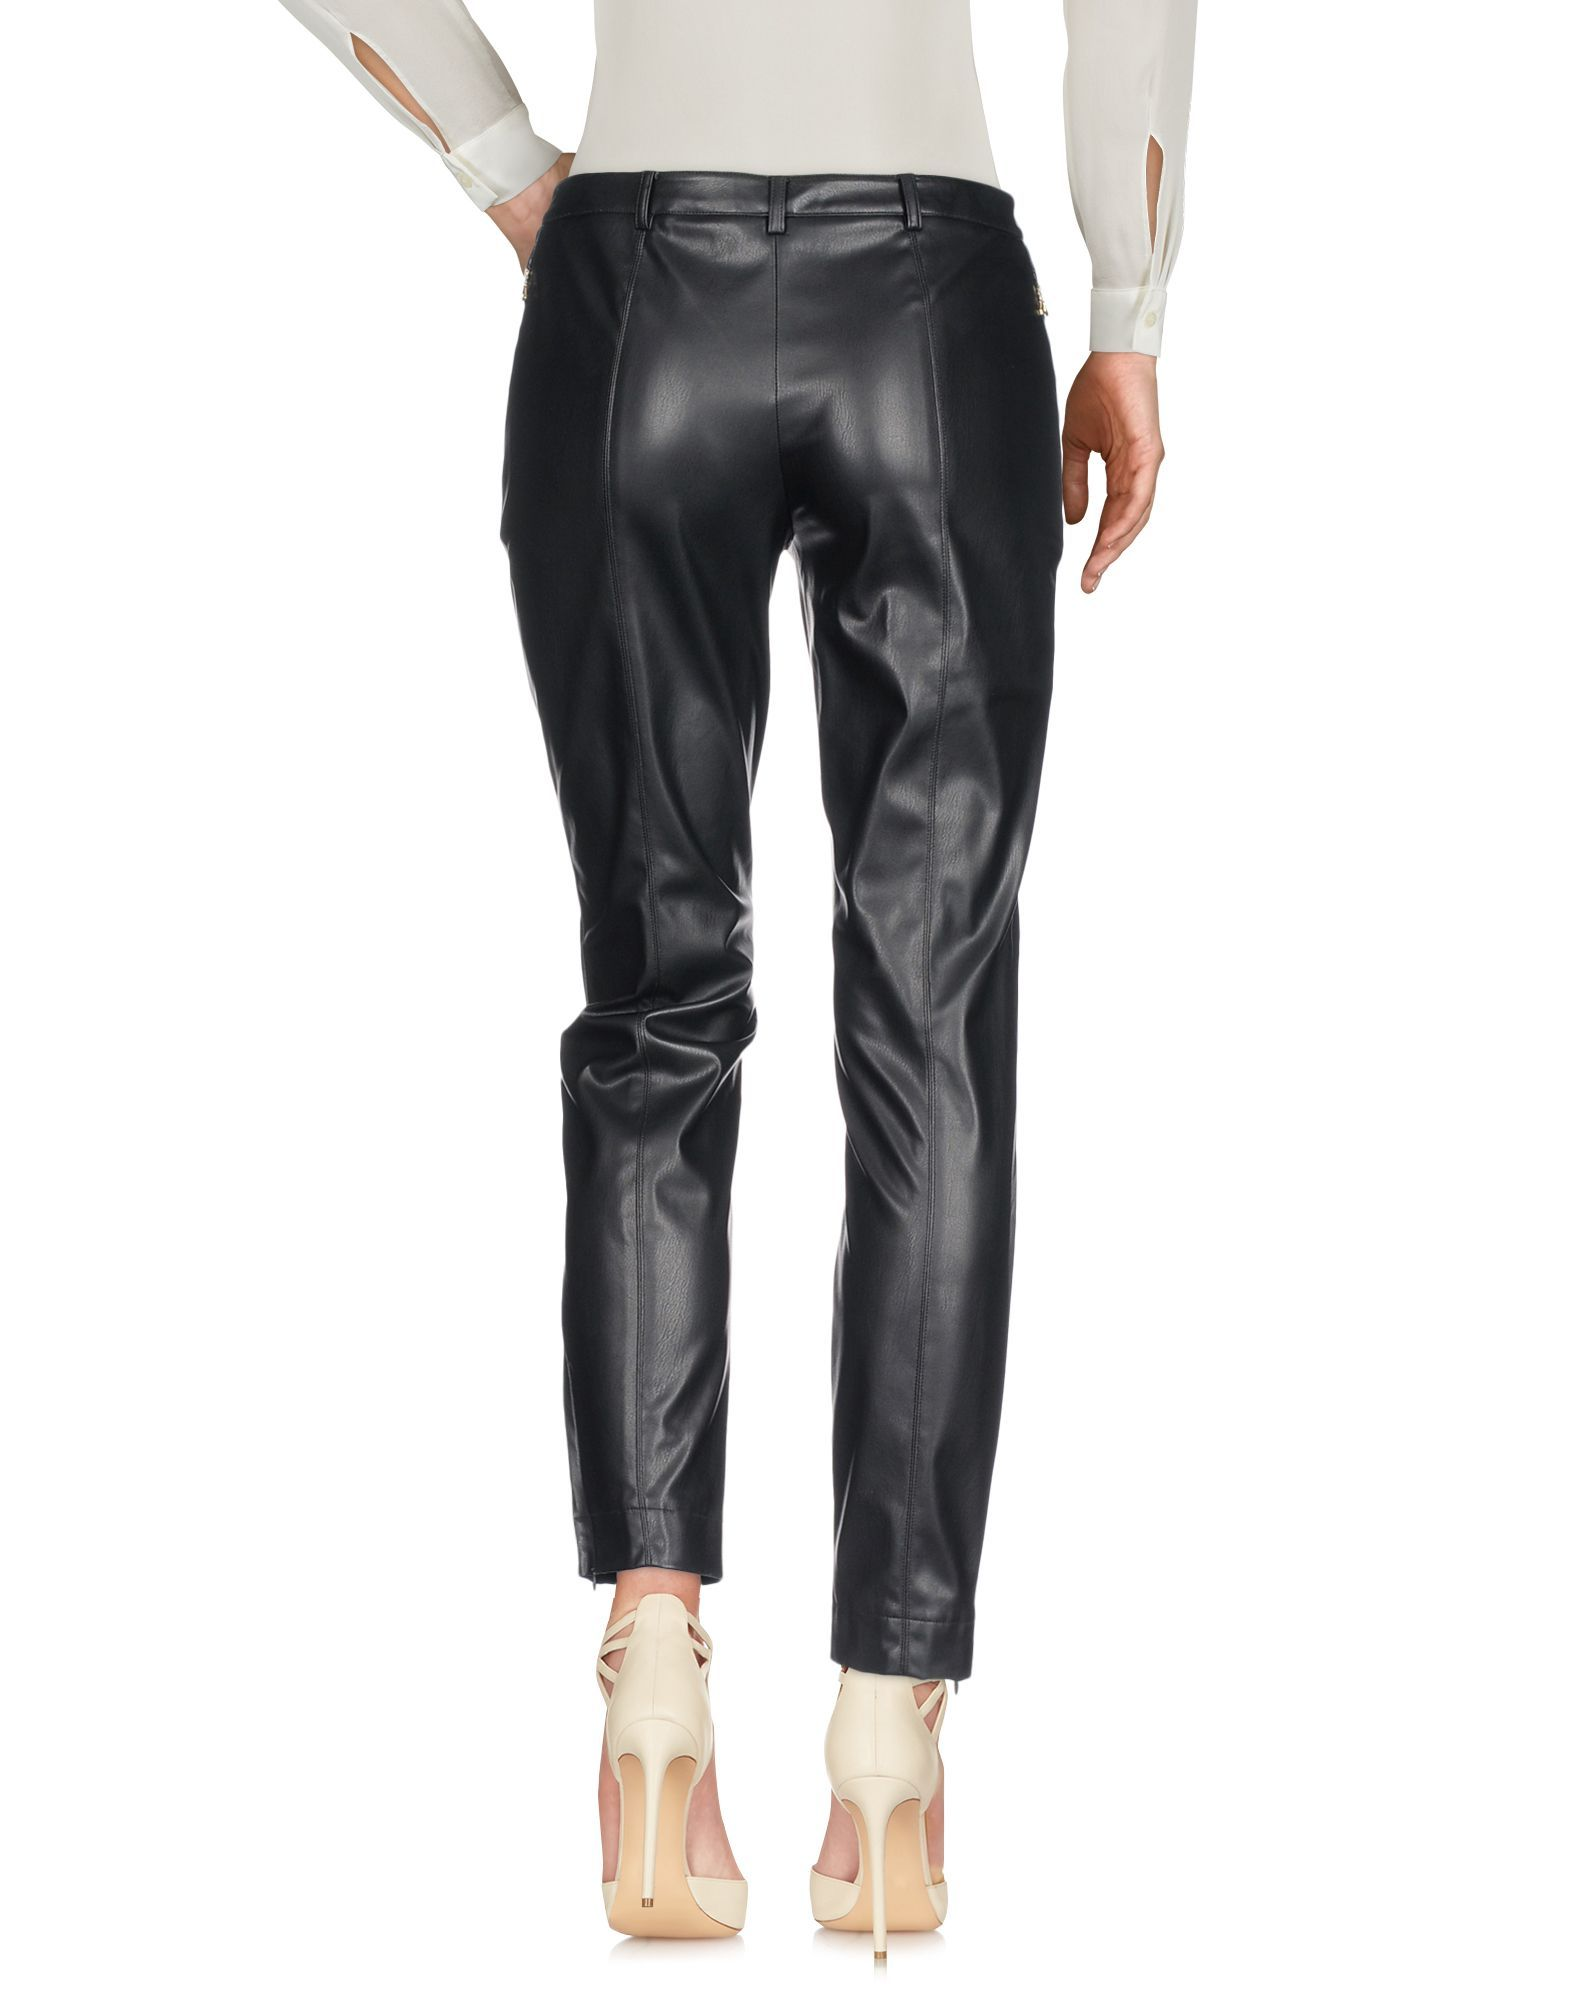 Patrizia Pepe Black Faux Leather Trousers